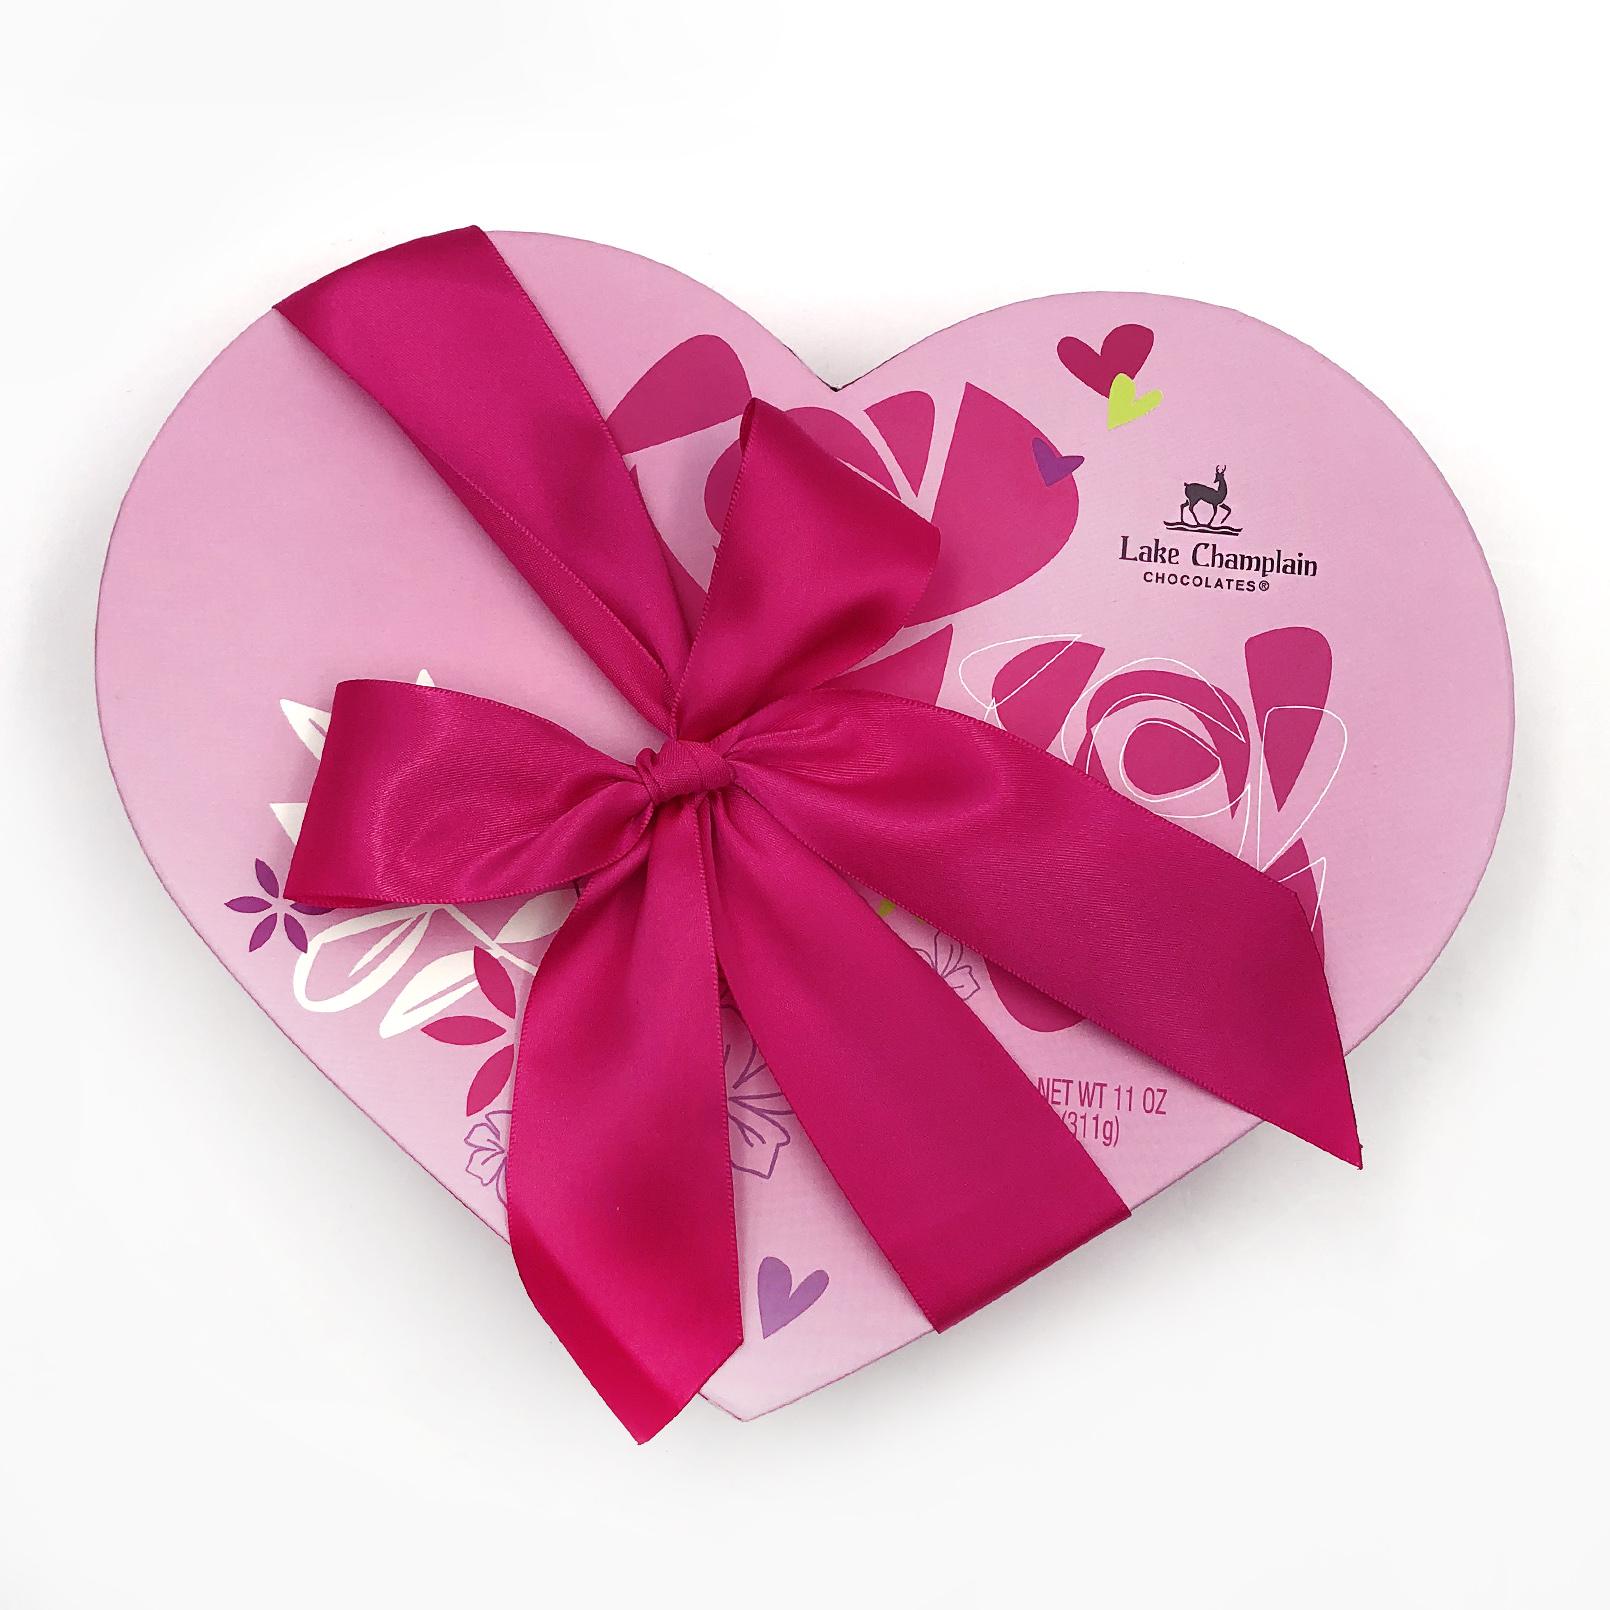 Valentine's Day at Palmer's Market - Chocolates by Lake Champlain